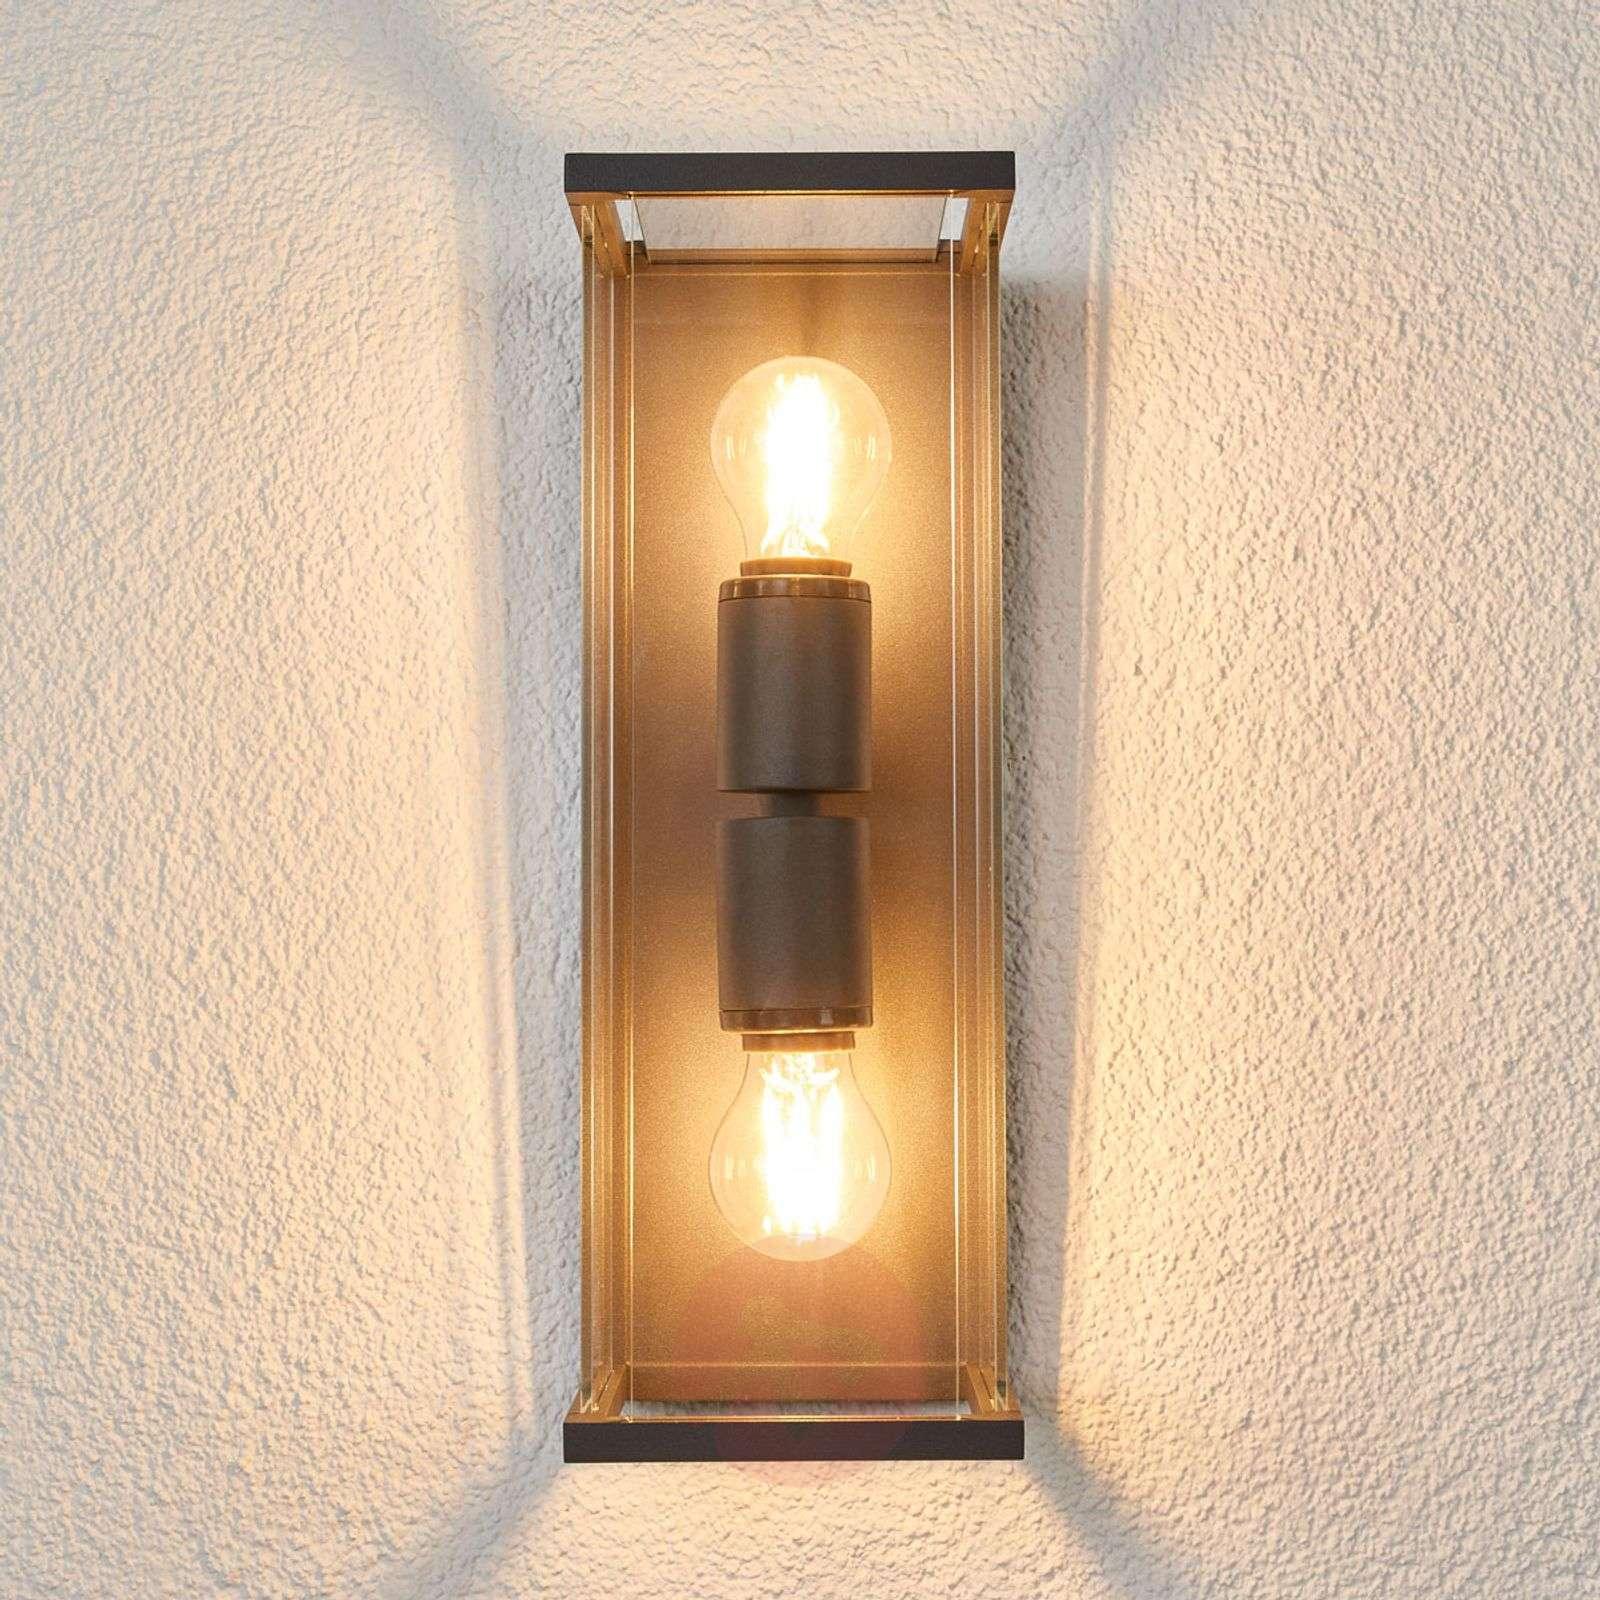 dea32bf3652 ... Glazed outdoor wall lamp Annalea-9616110-01 ...